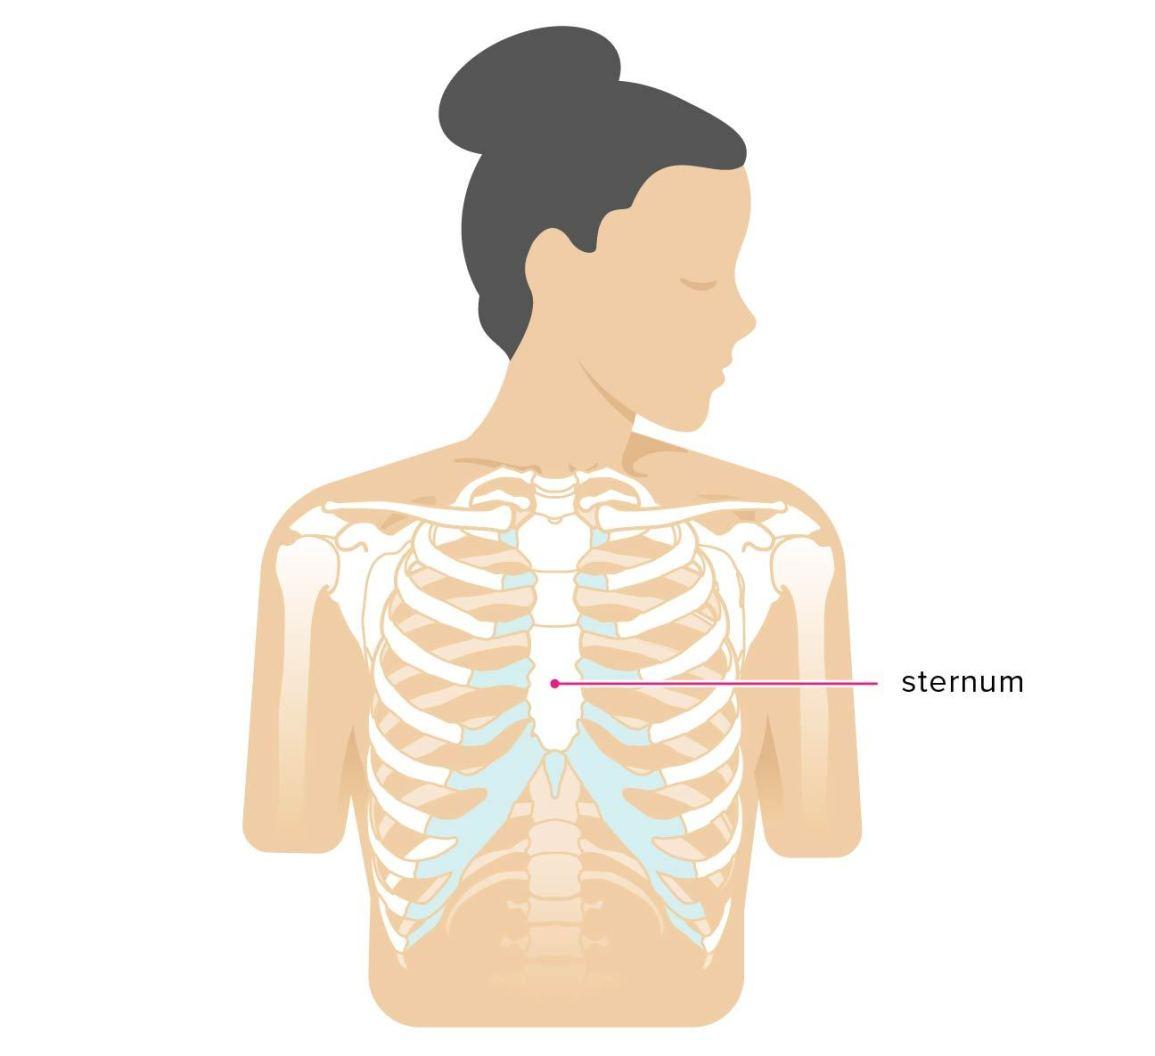 Hurt clipart bone pain. Sternum popping treatment chest